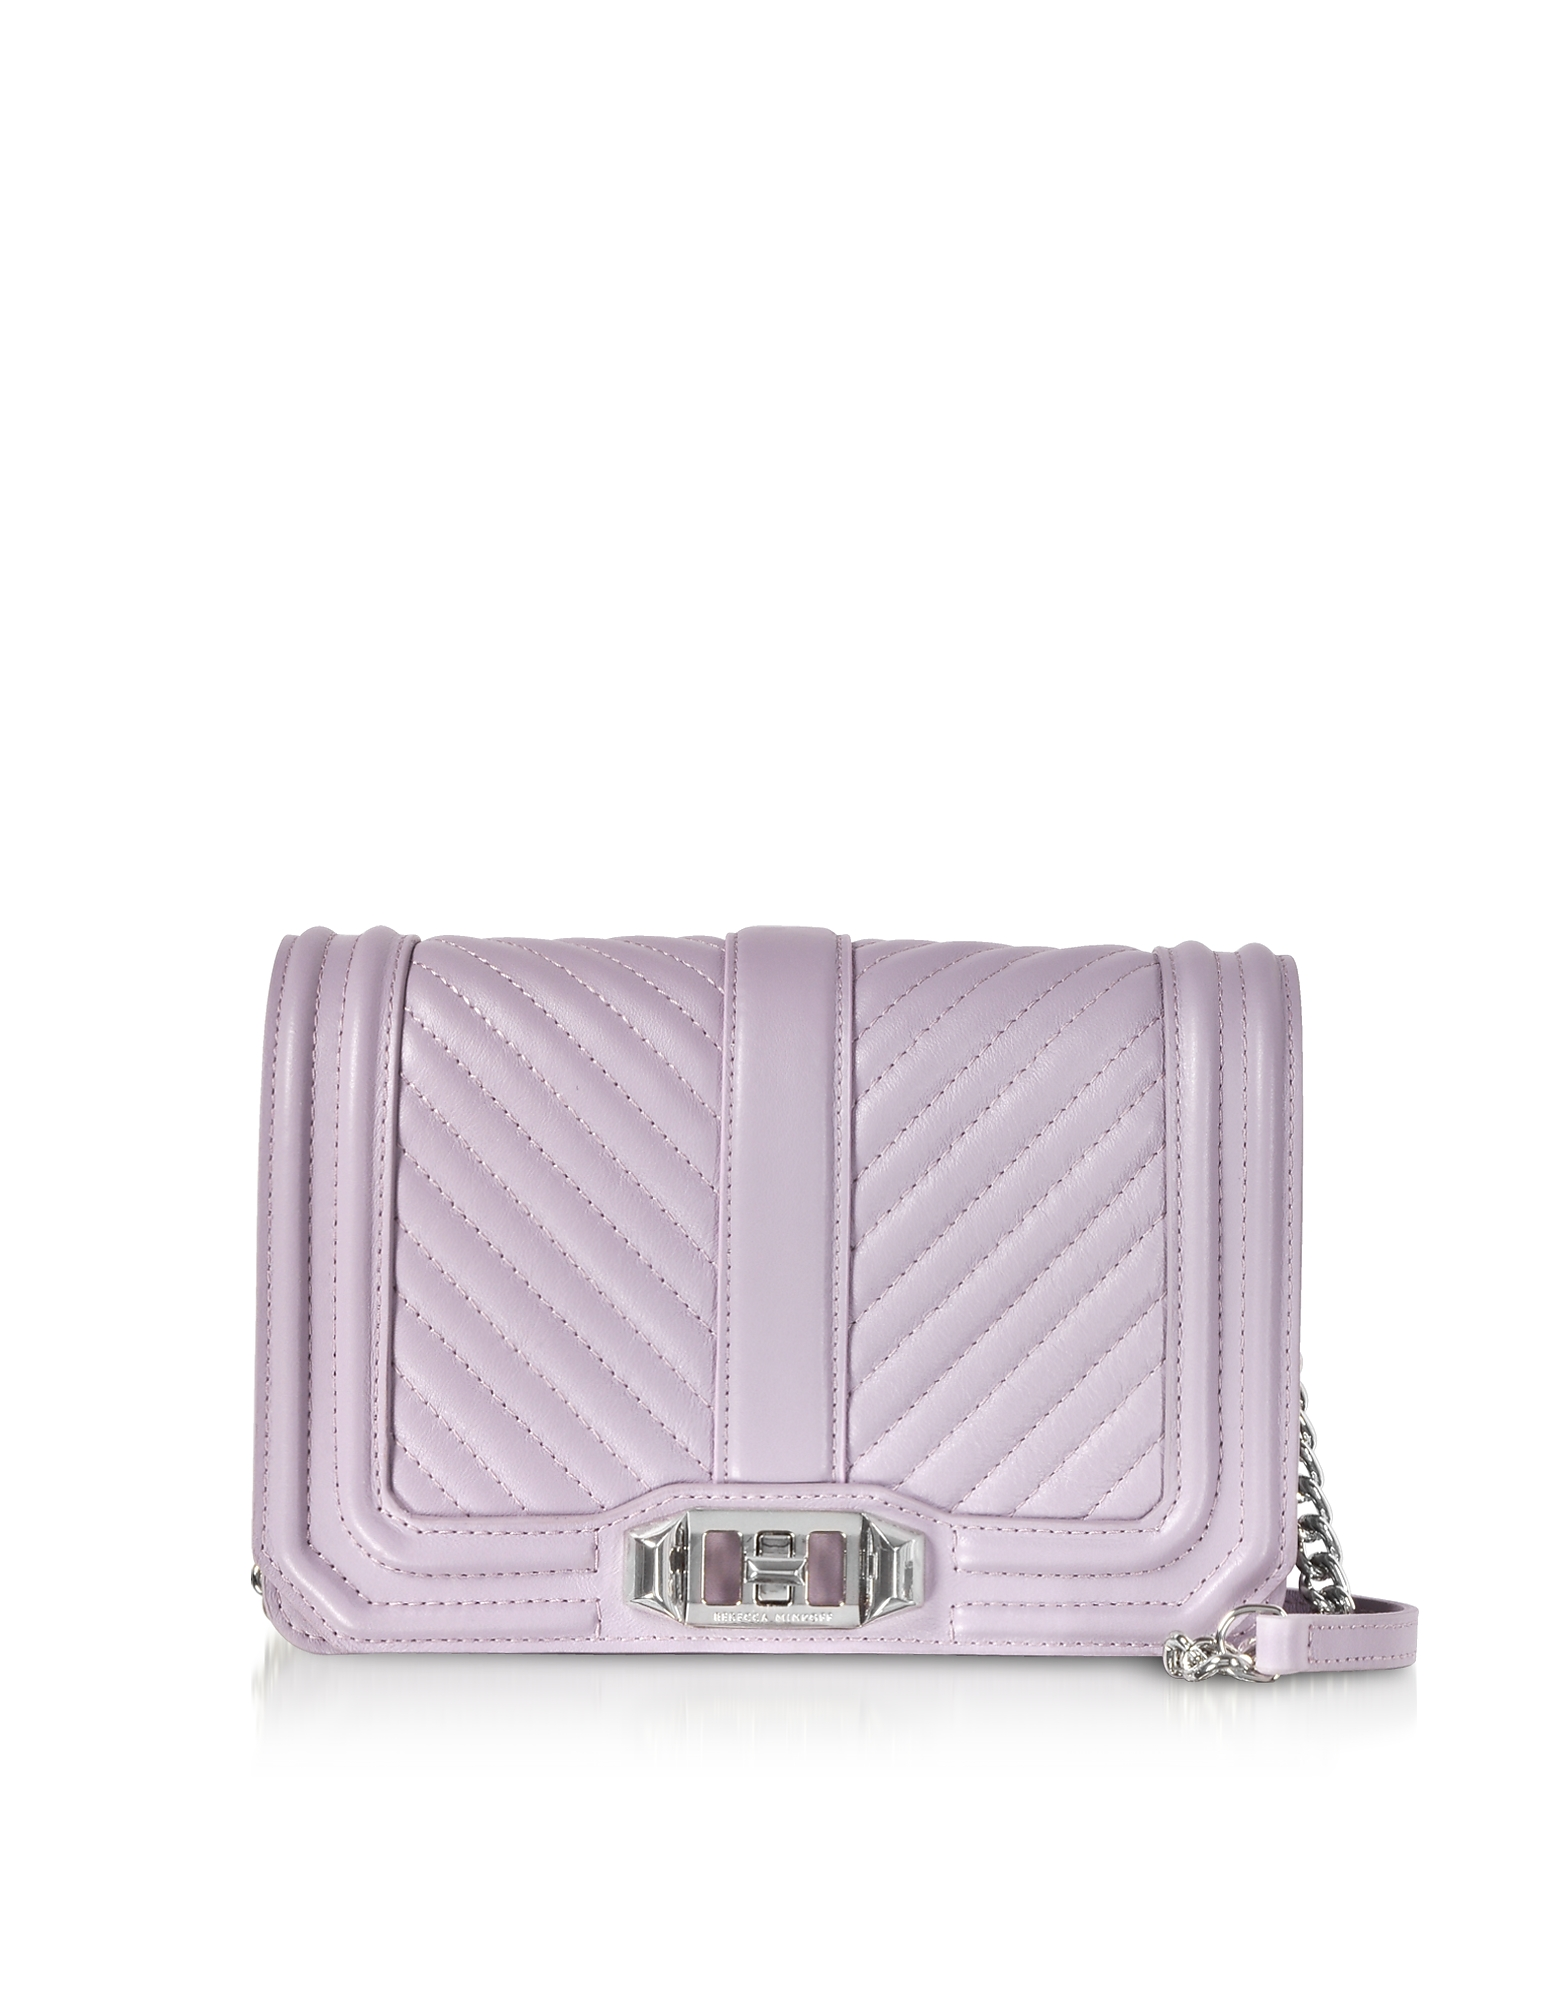 Rebecca Minkoff Designer Handbags, Chevron Quilted Leather Small Love Crossbody